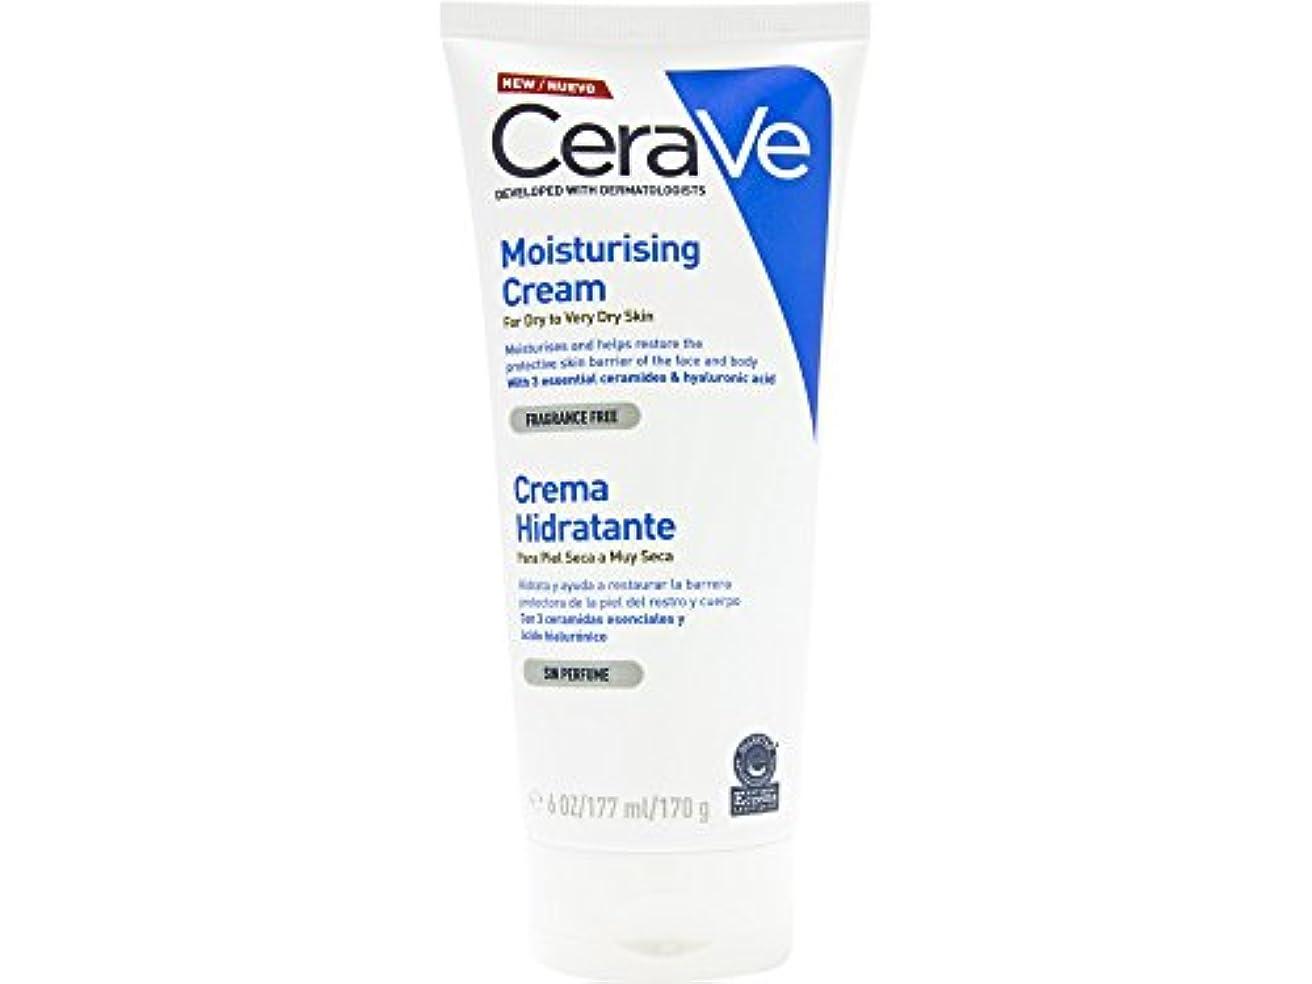 飛行機語湖Cerave Dry And Very Dry Skin Moisturizing Cream 170ml [並行輸入品]